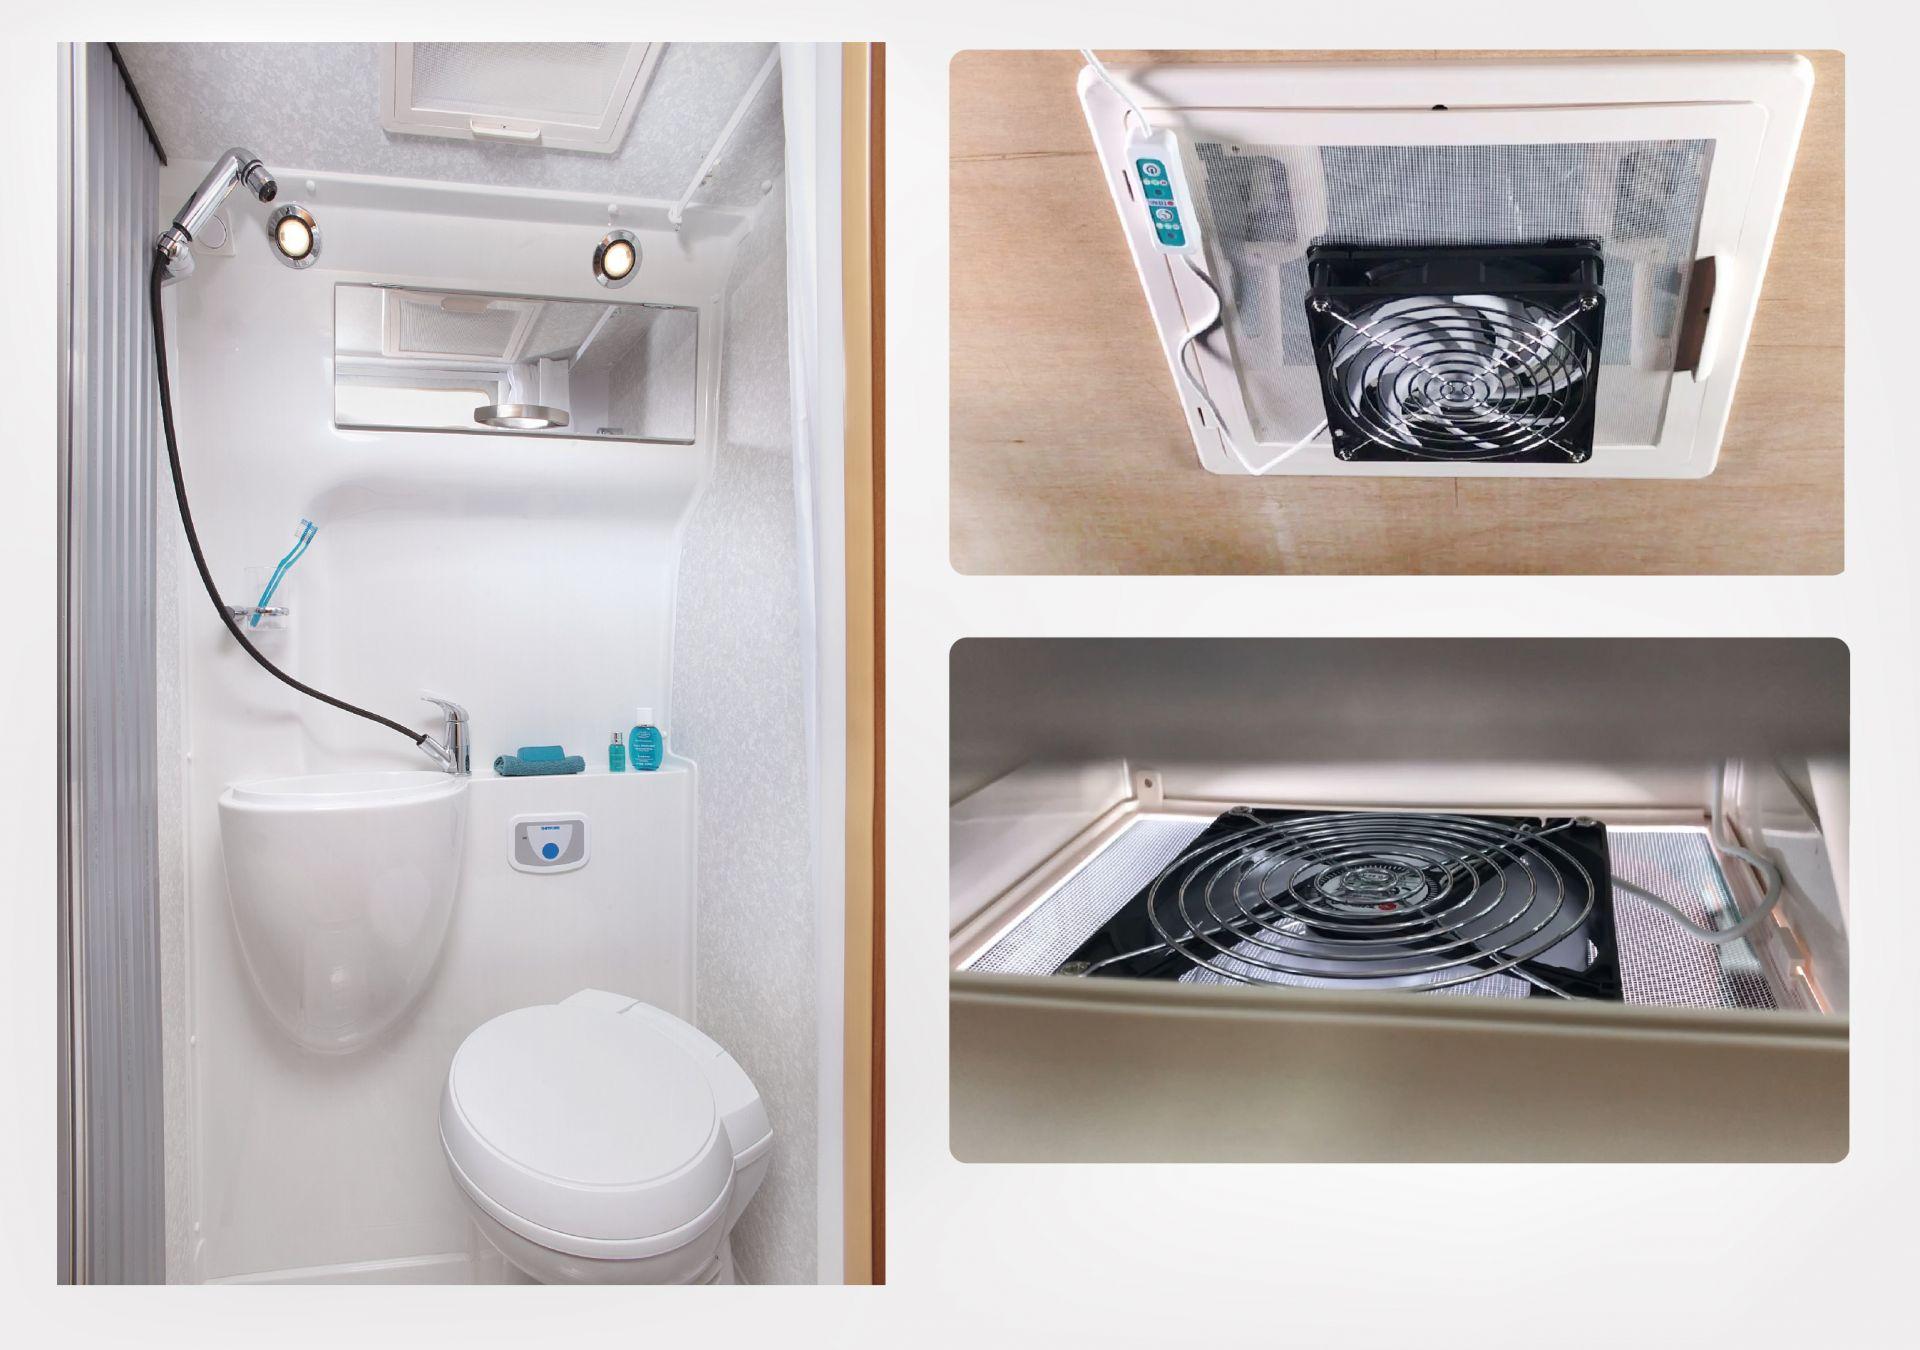 RVトイレとバスルームの屋上窓に最適です。